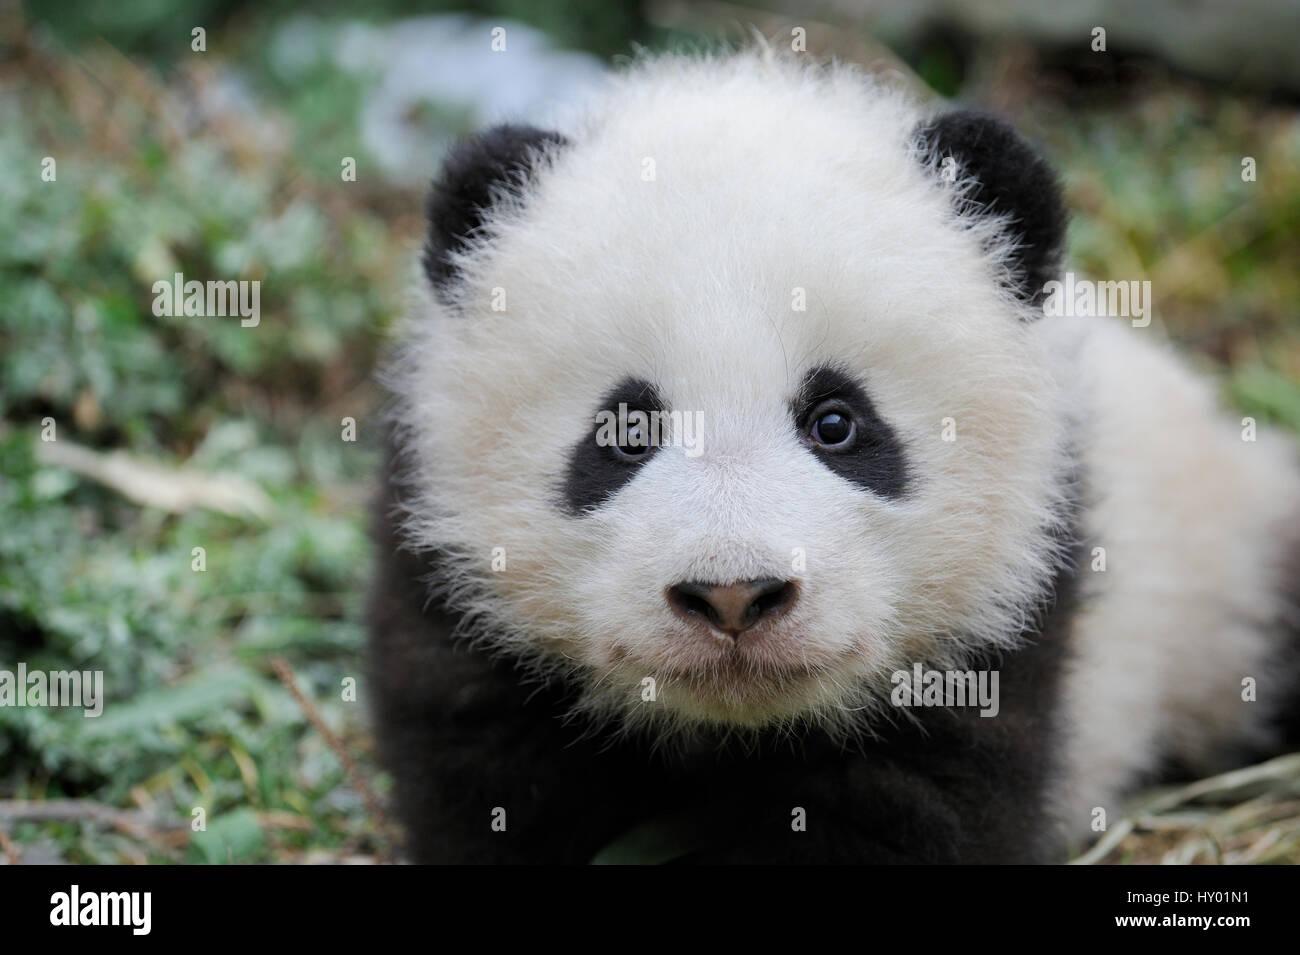 Head portrait of Giant panda  (Ailuropoda melanoleuca) cub aged 5 months. Wolong Nature Reserve, Wenchuan, Sichuan - Stock Image